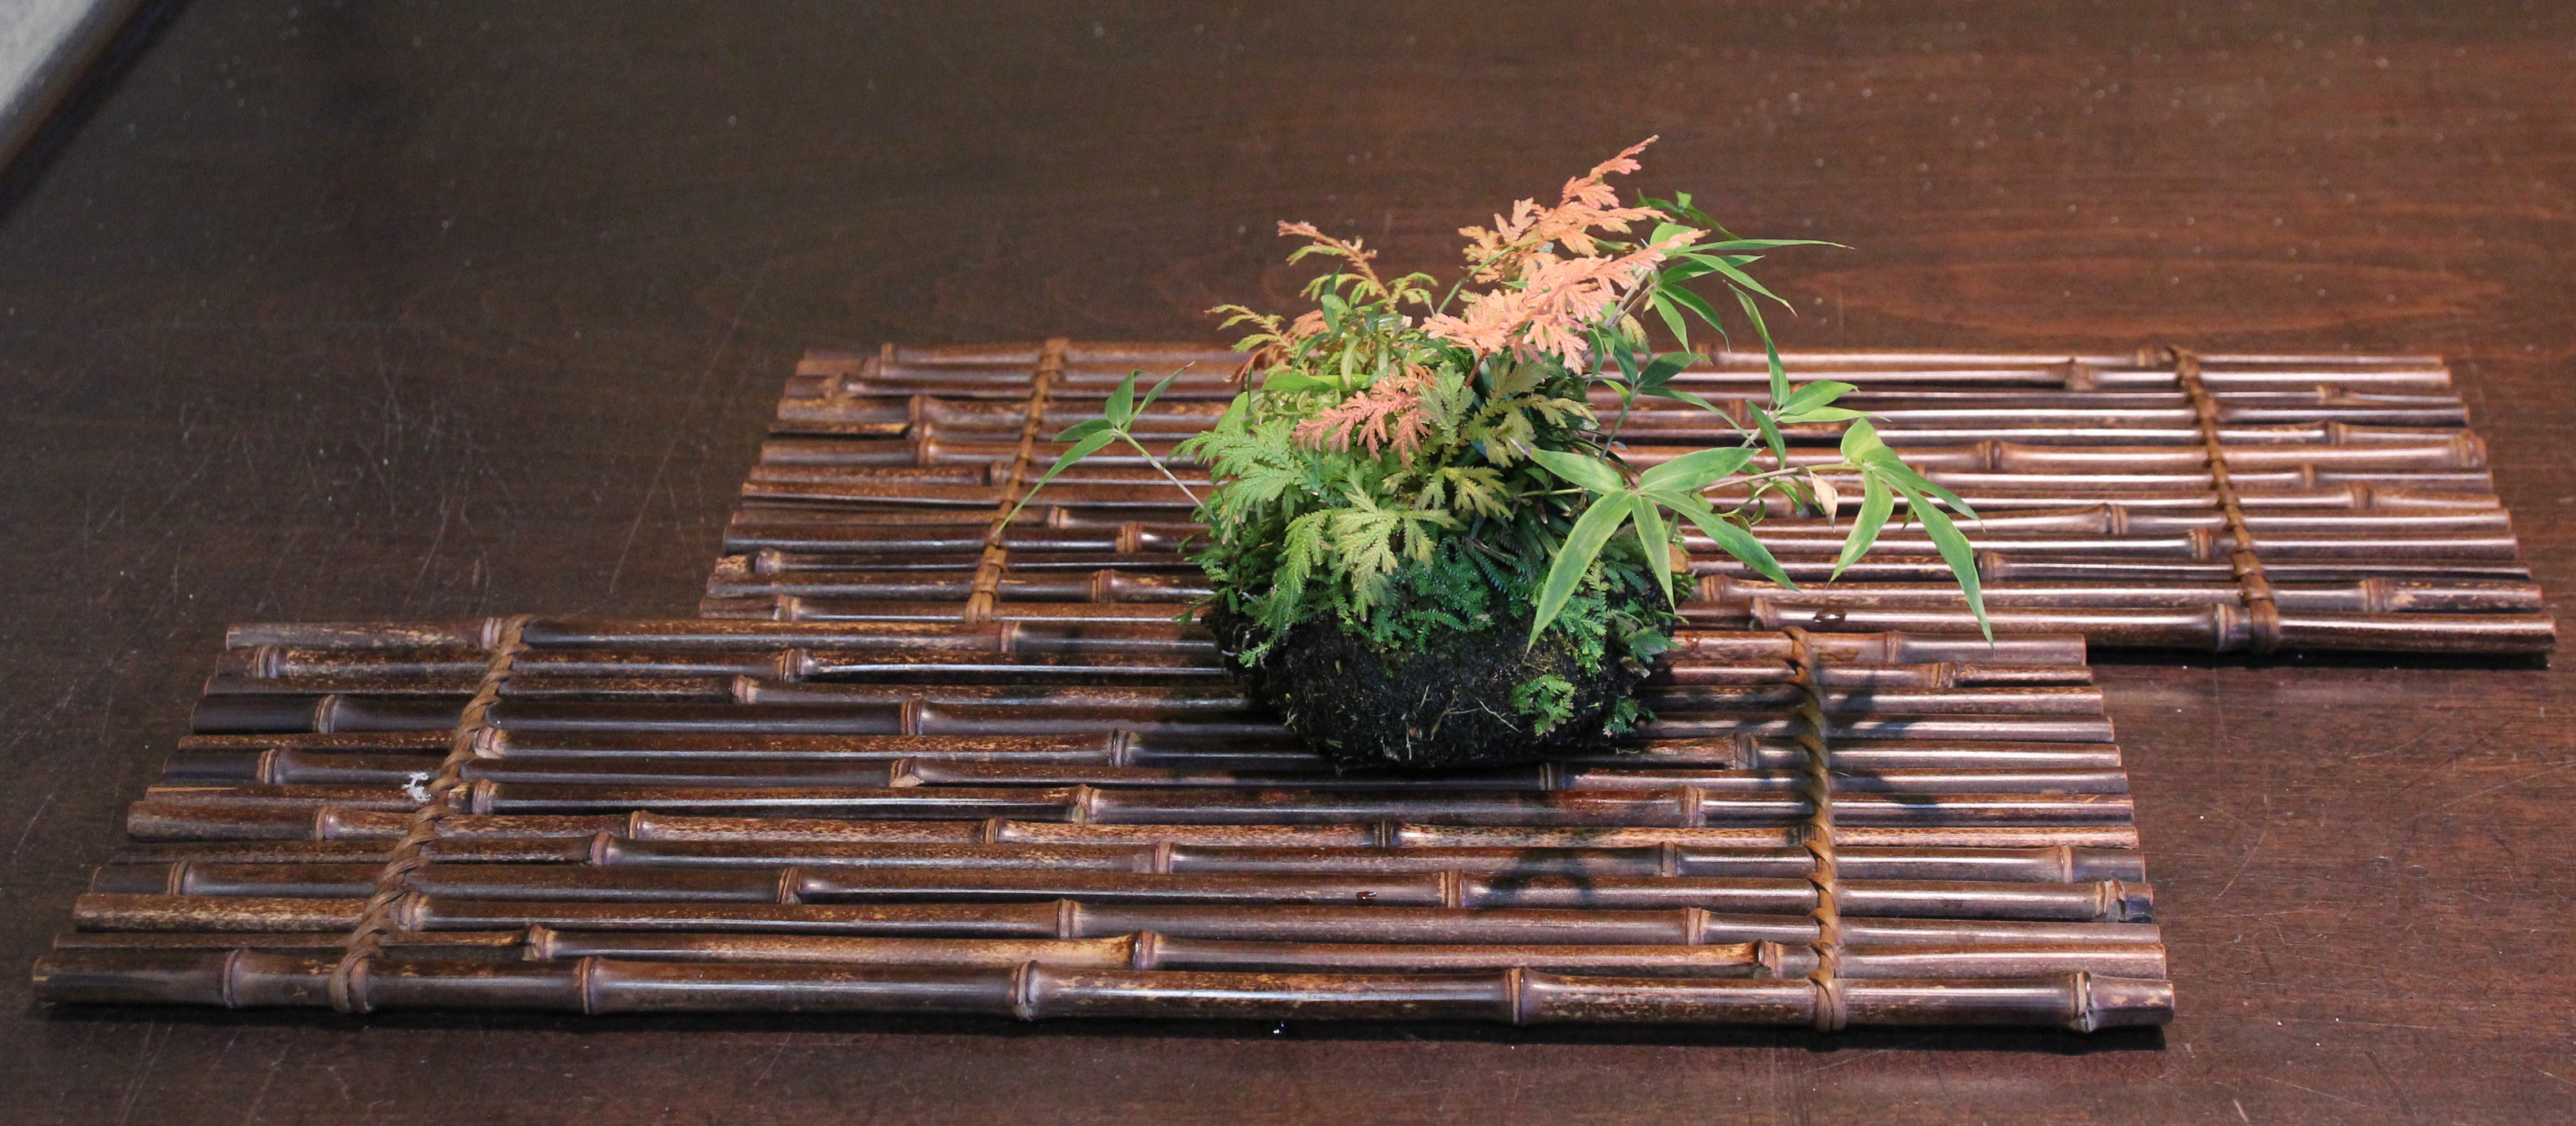 http://bonsai-shohin.com/wp-content/uploads/2017/09/kusamono-en-exposition.jpg